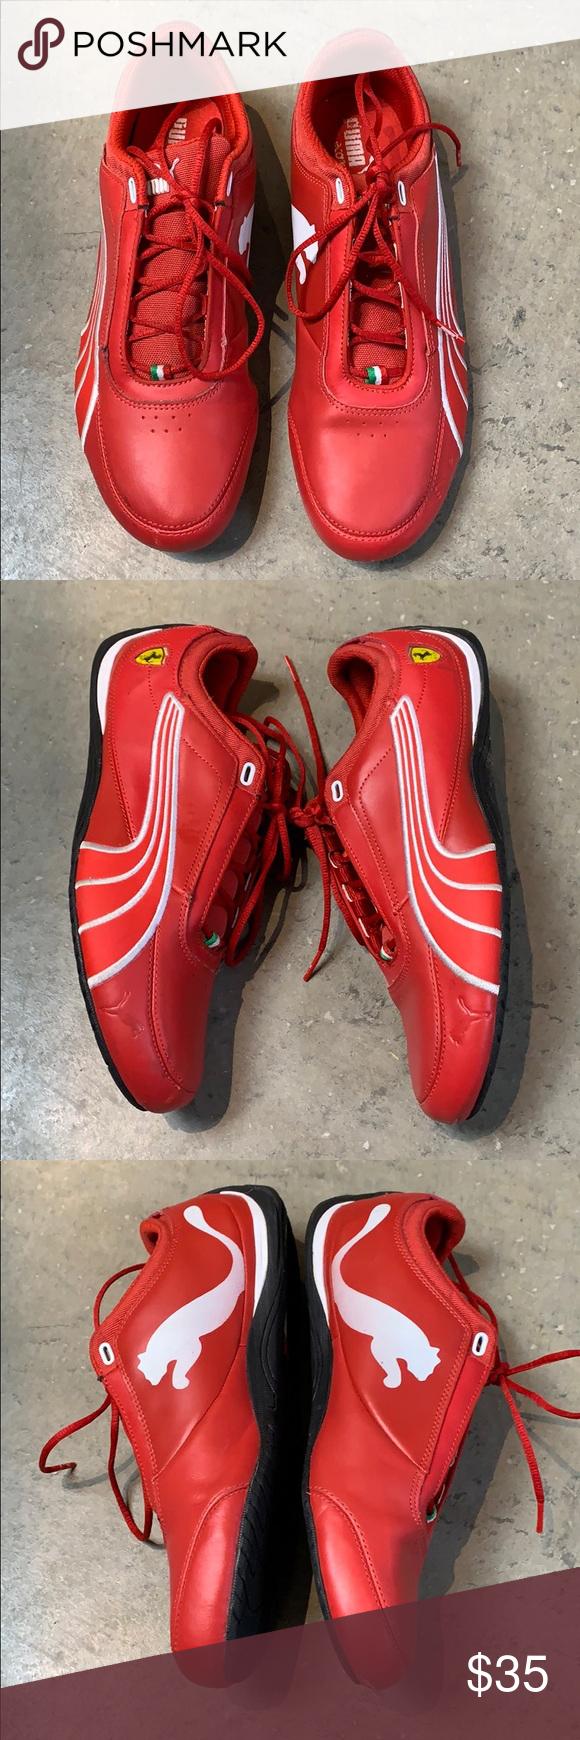 Puma Ferrari Racing Shoes Racing Shoes Shoes Puma